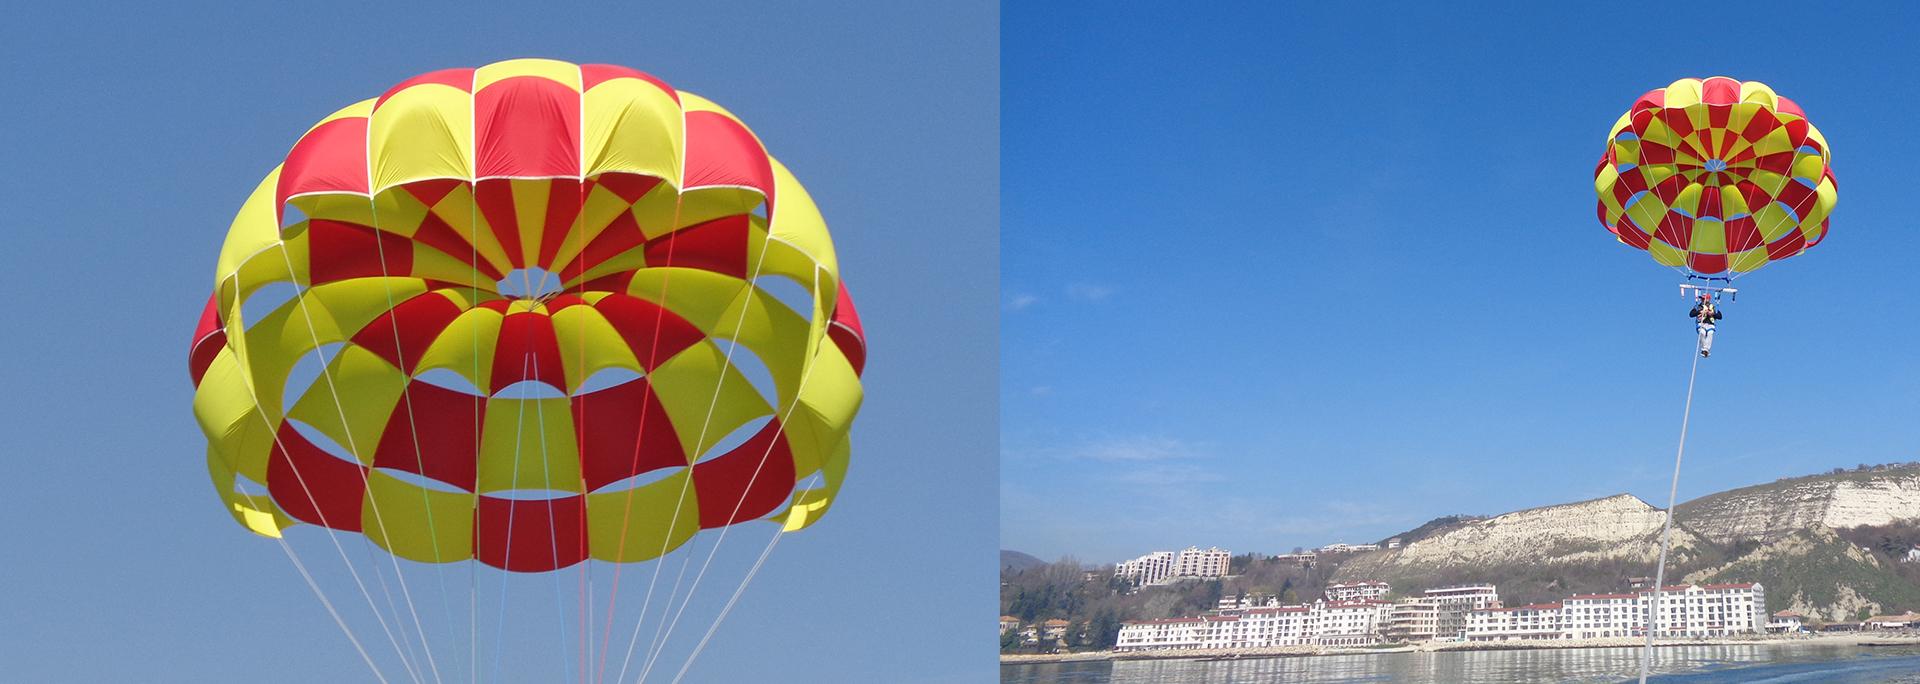 дизайн, производство и оборудване за парашути - парасейлинг